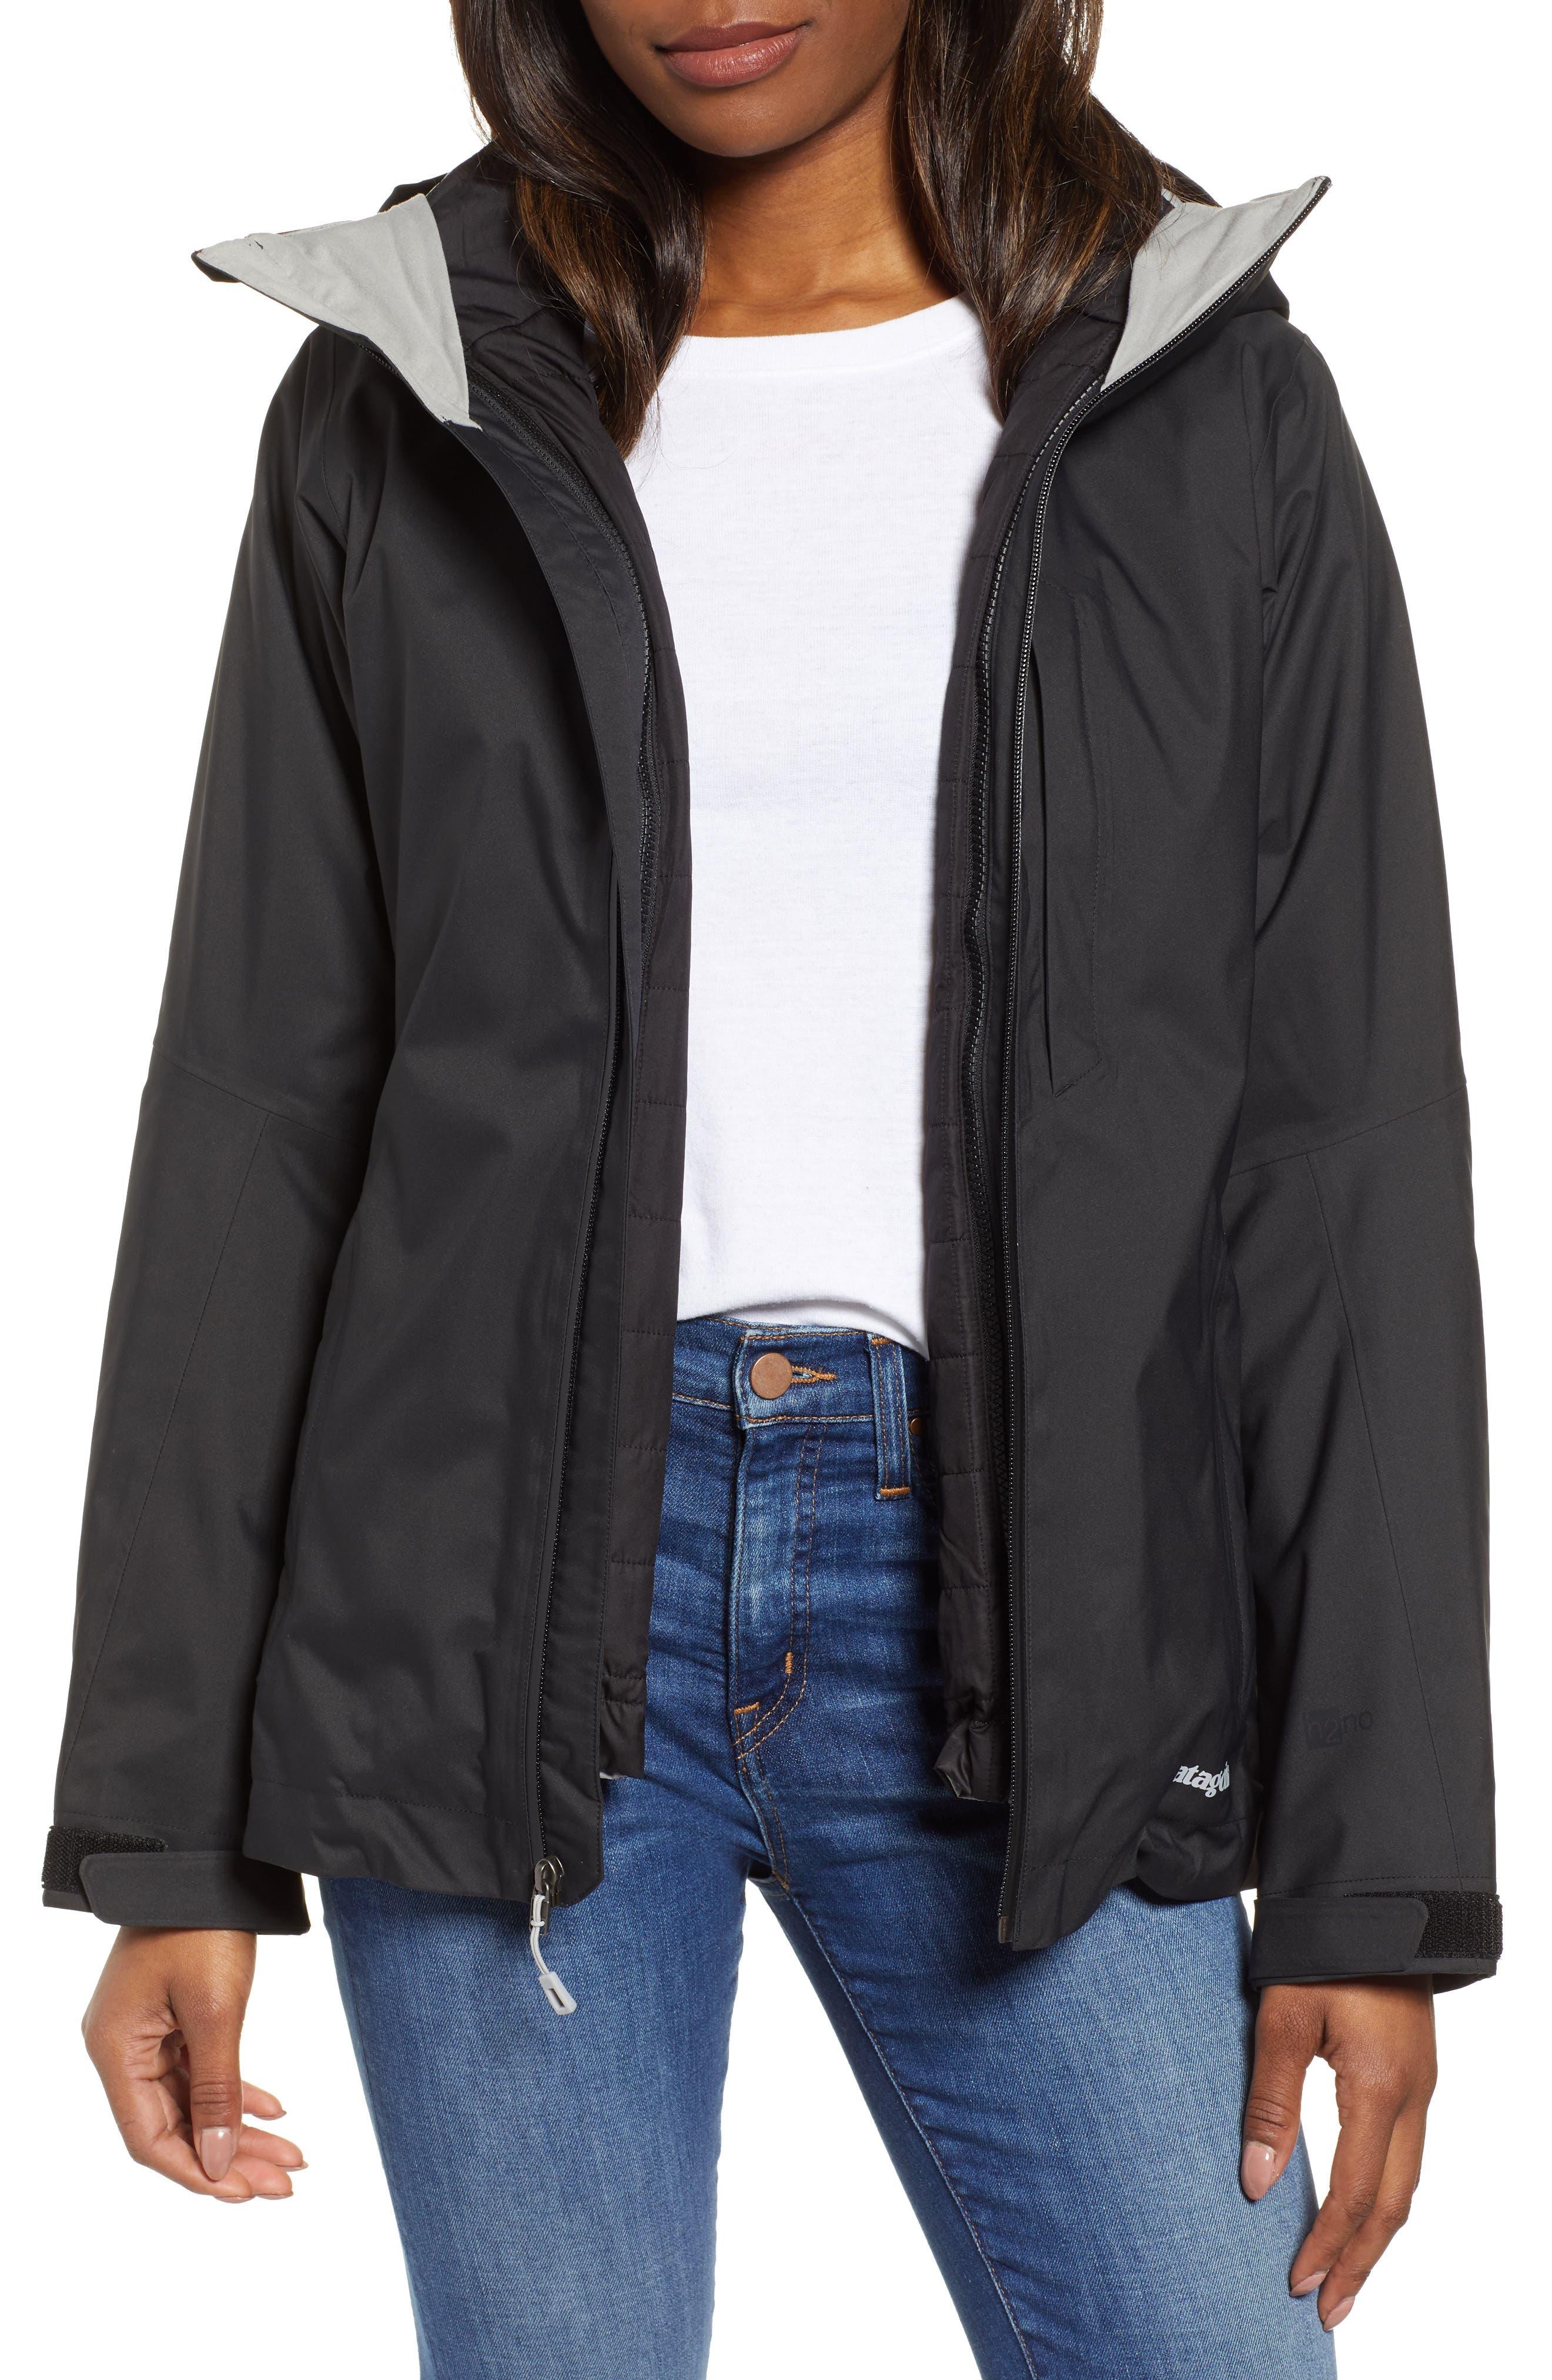 Snowbelle 3-in-1 Jacket,                             Main thumbnail 1, color,                             BLACK